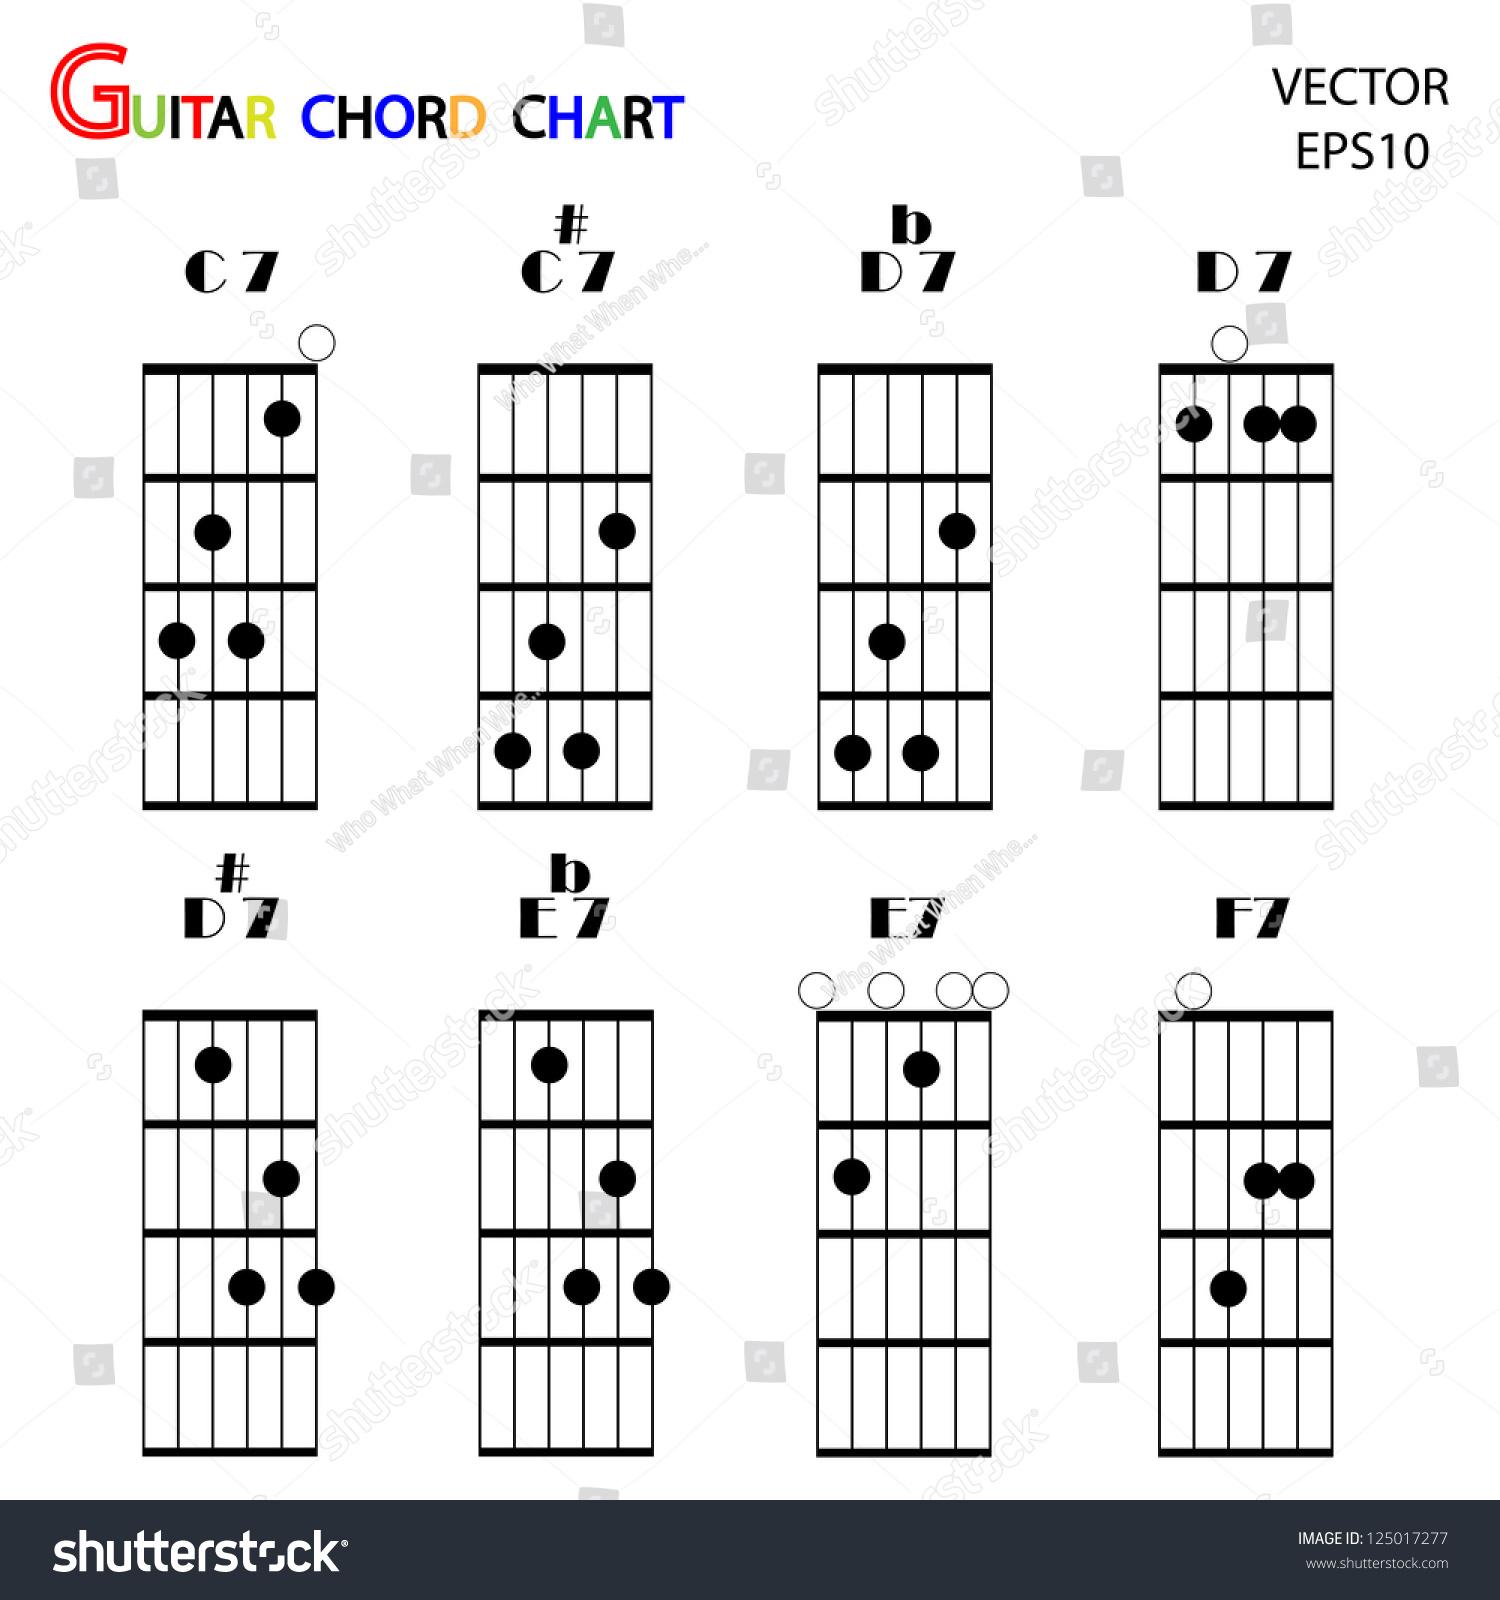 Basic guitar chords tab guitar chordsvector stock vector 125017277 basic guitar chords tab guitar chordsvector hexwebz Choice Image